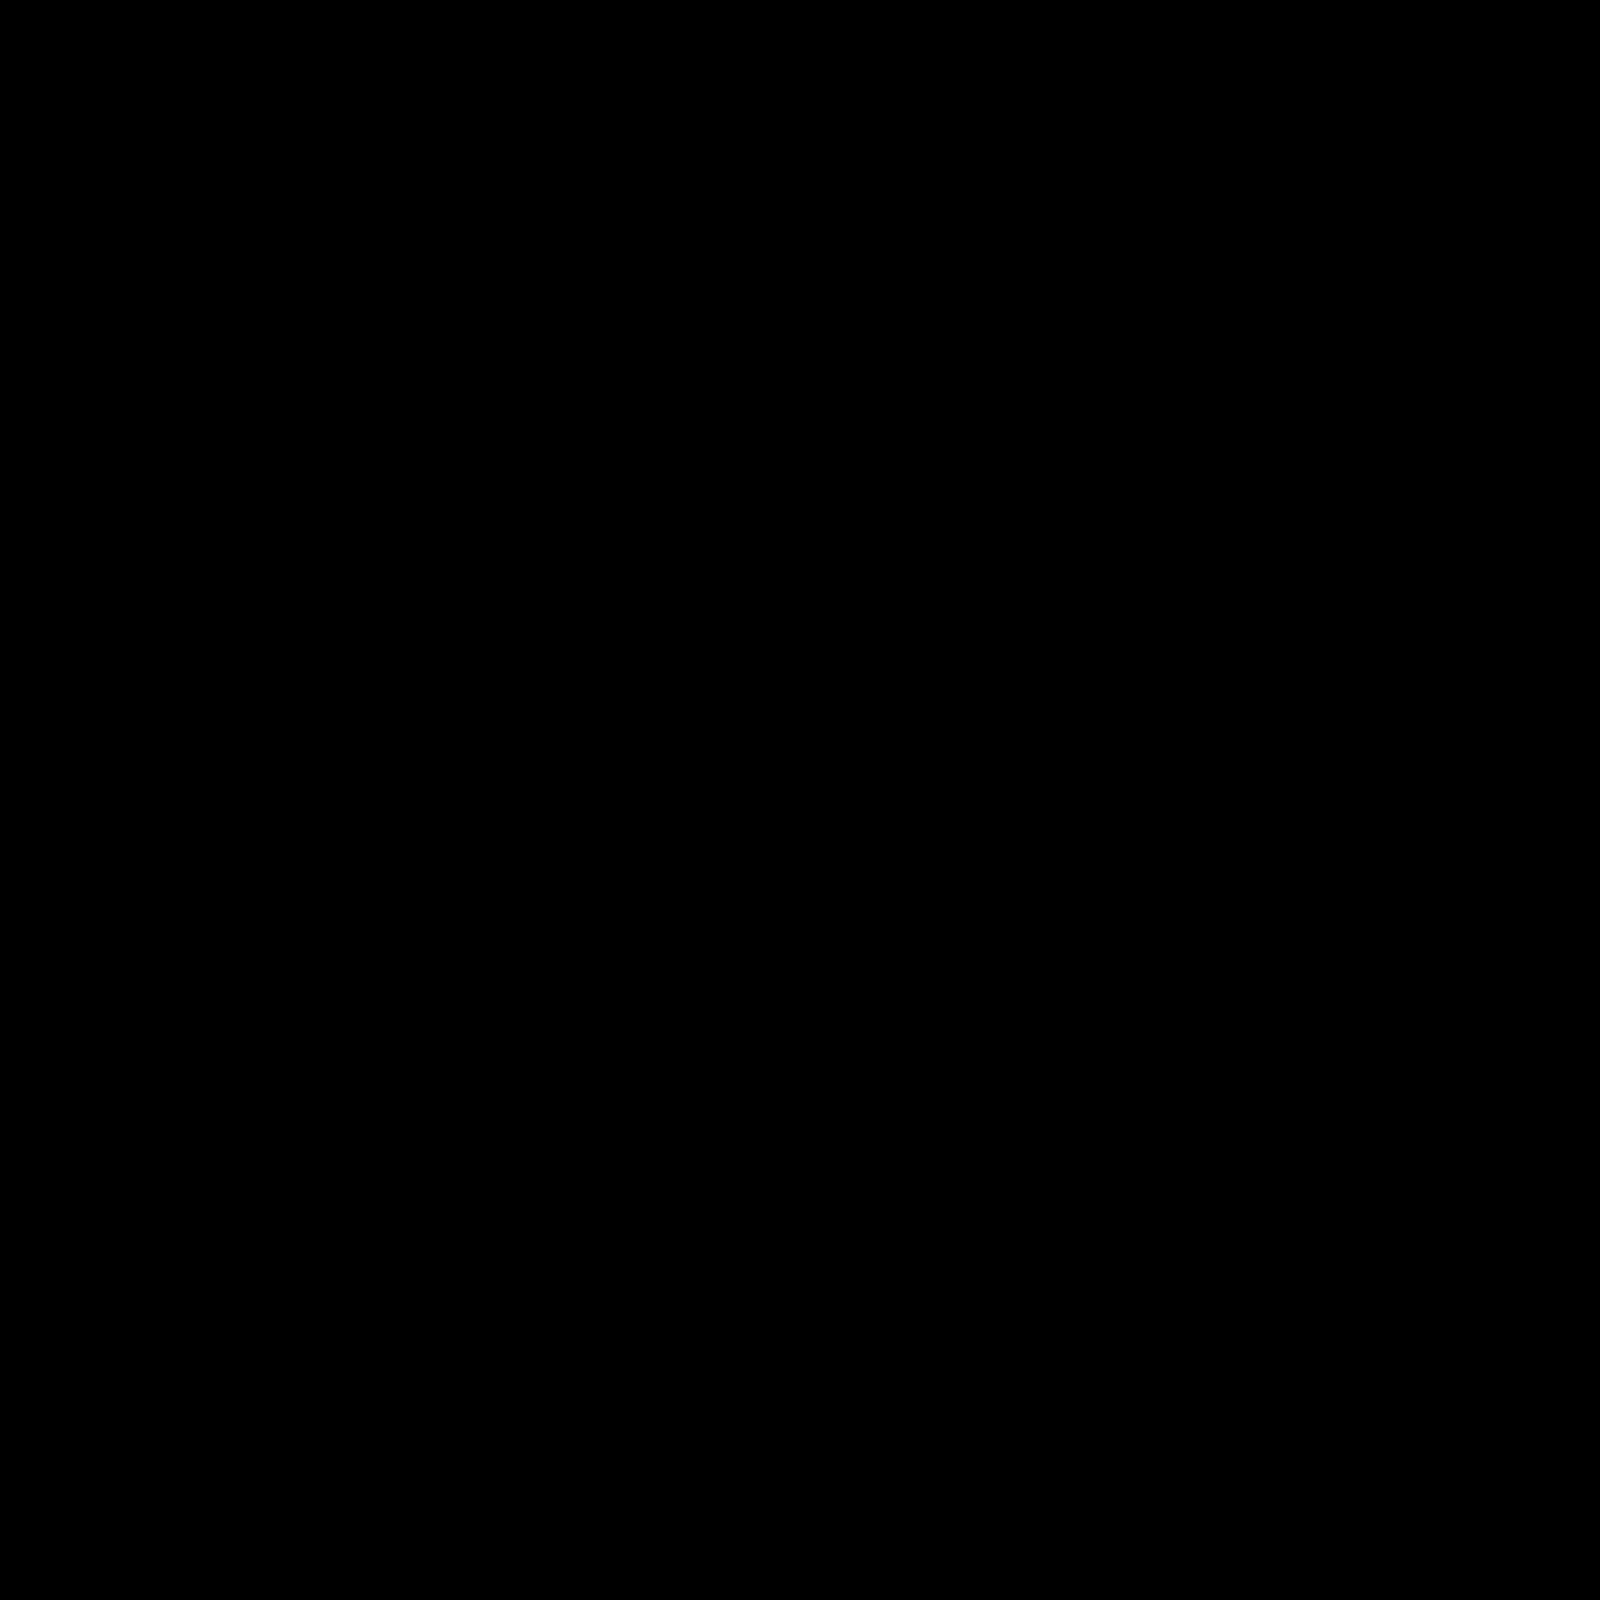 Scissor Lift icon - PNG Lift